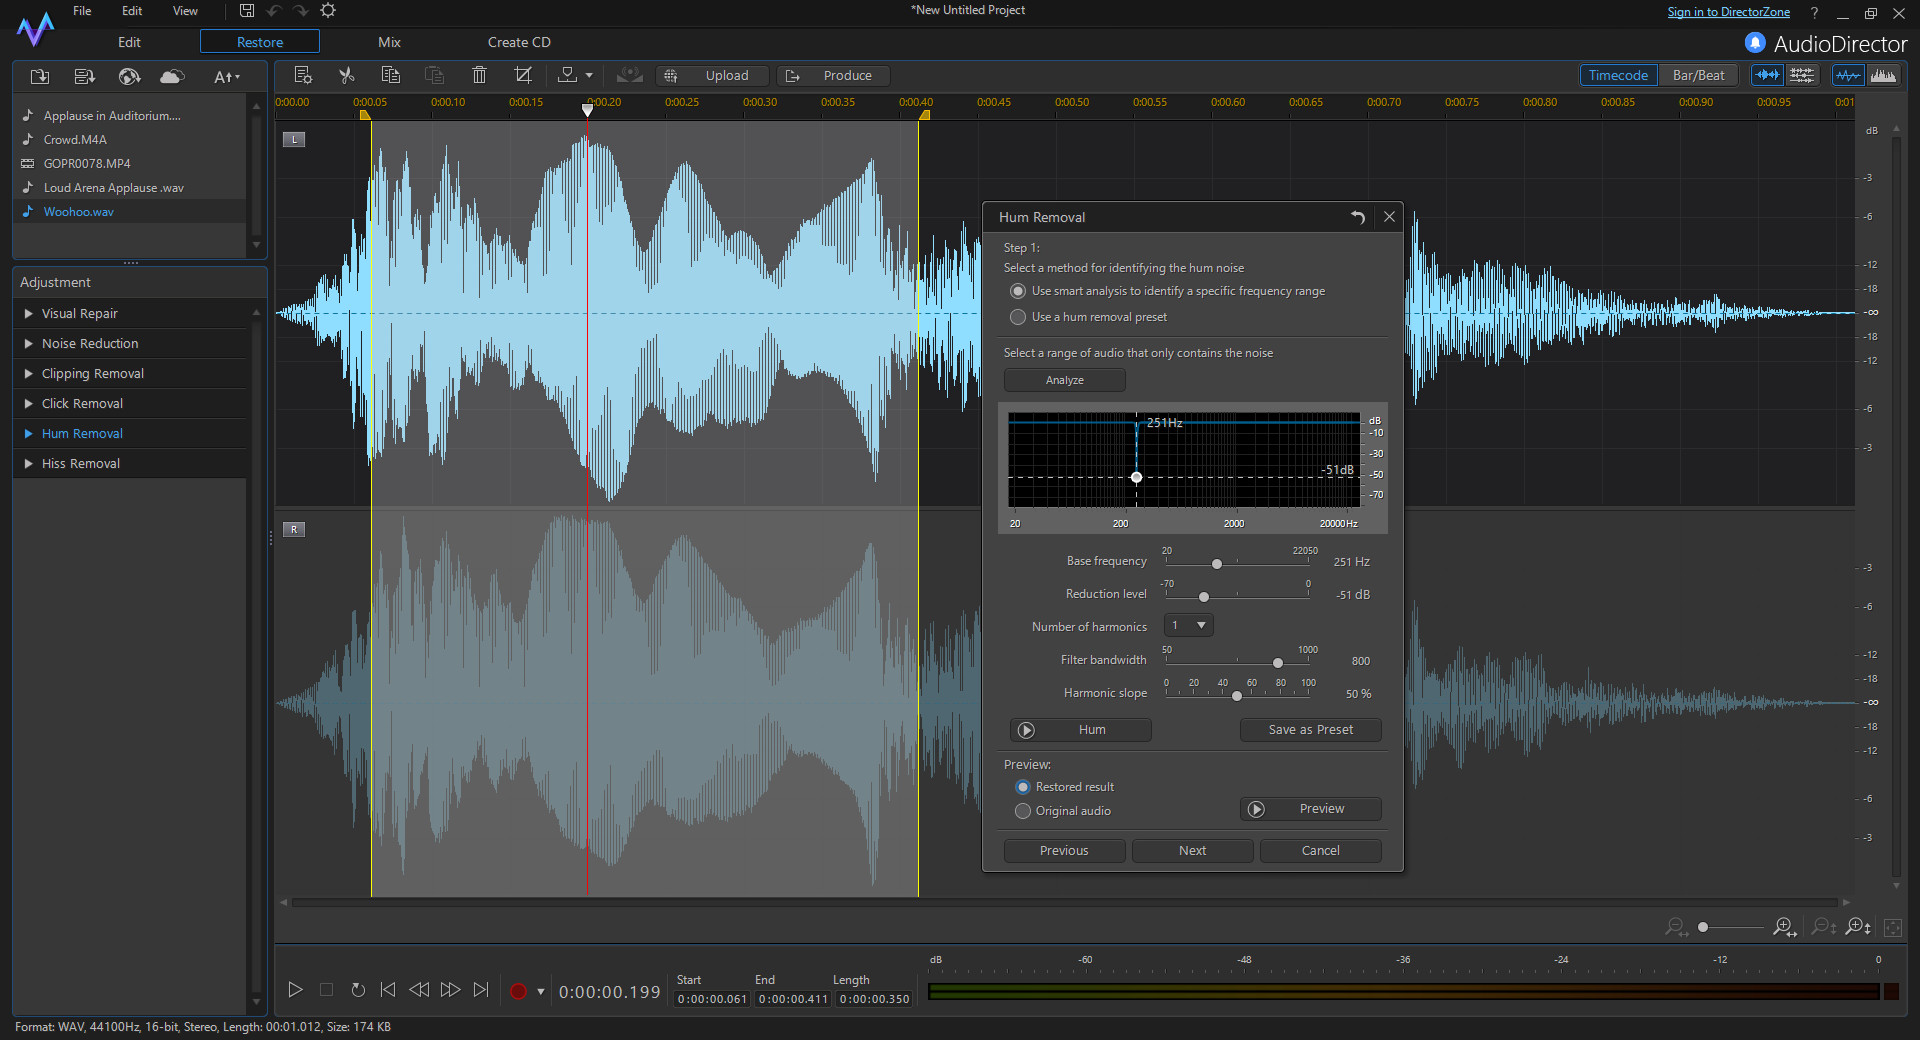 audiodirector 7 ultra